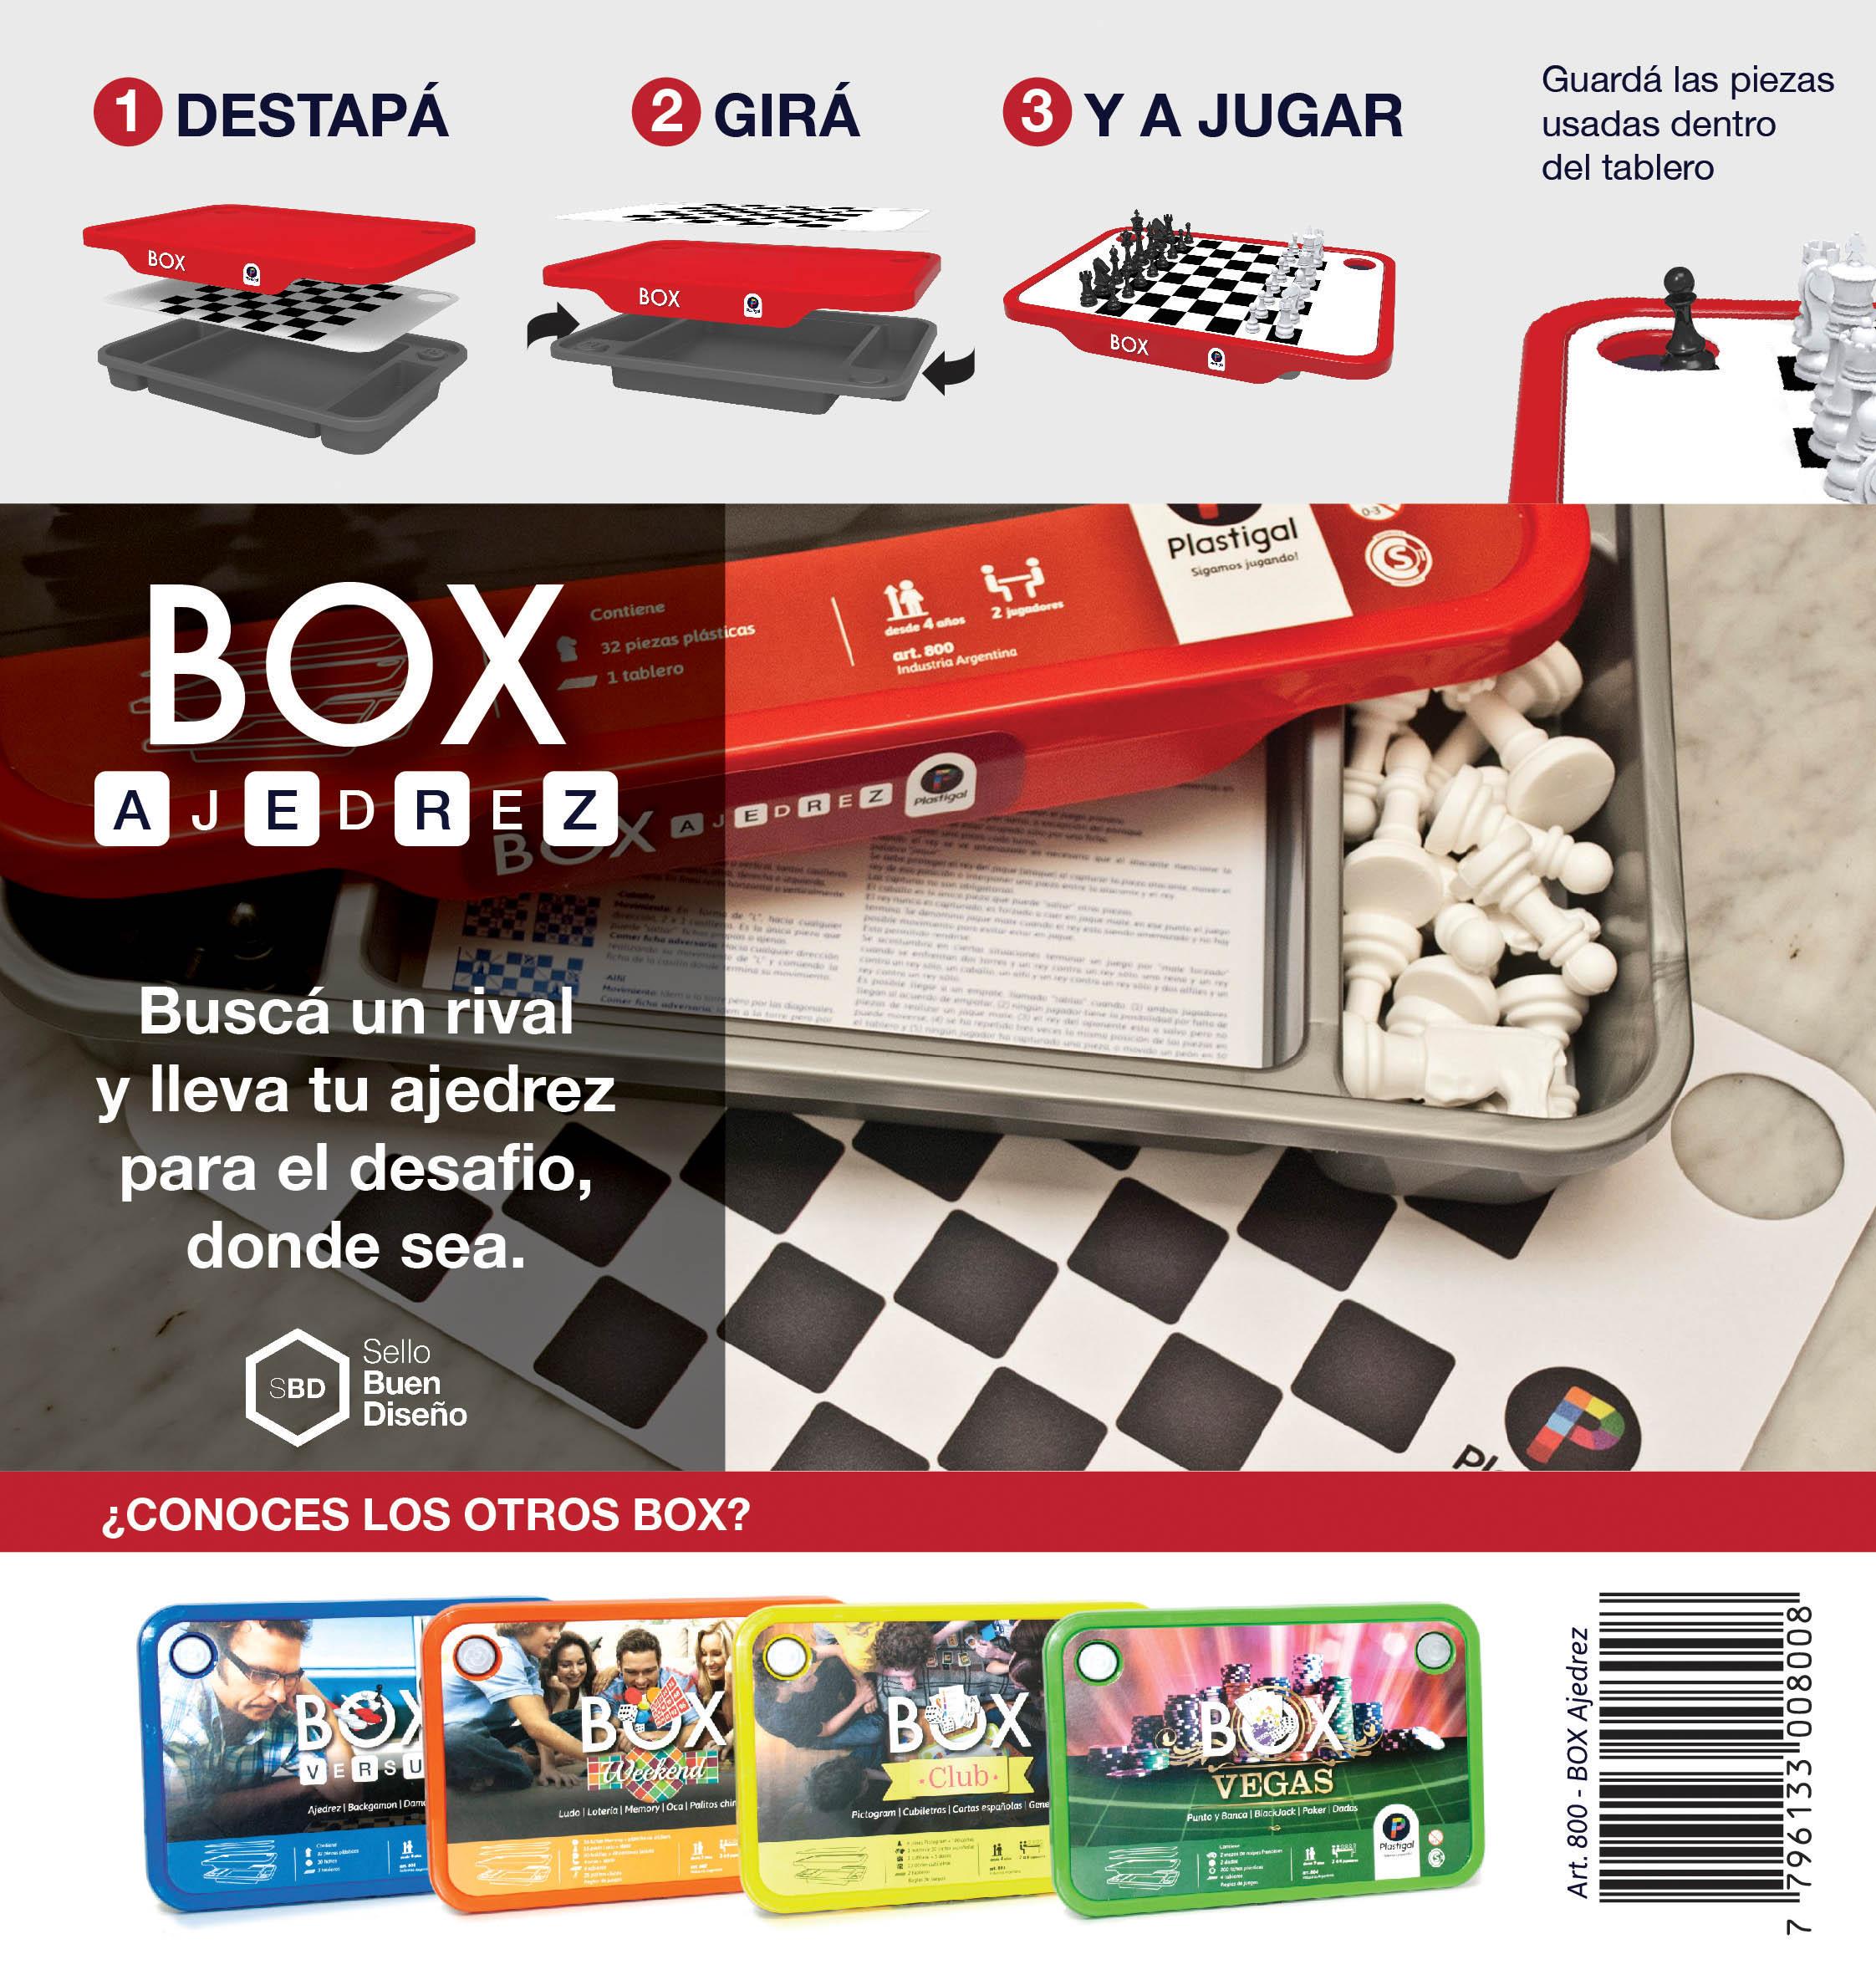 BOX Ajedrez